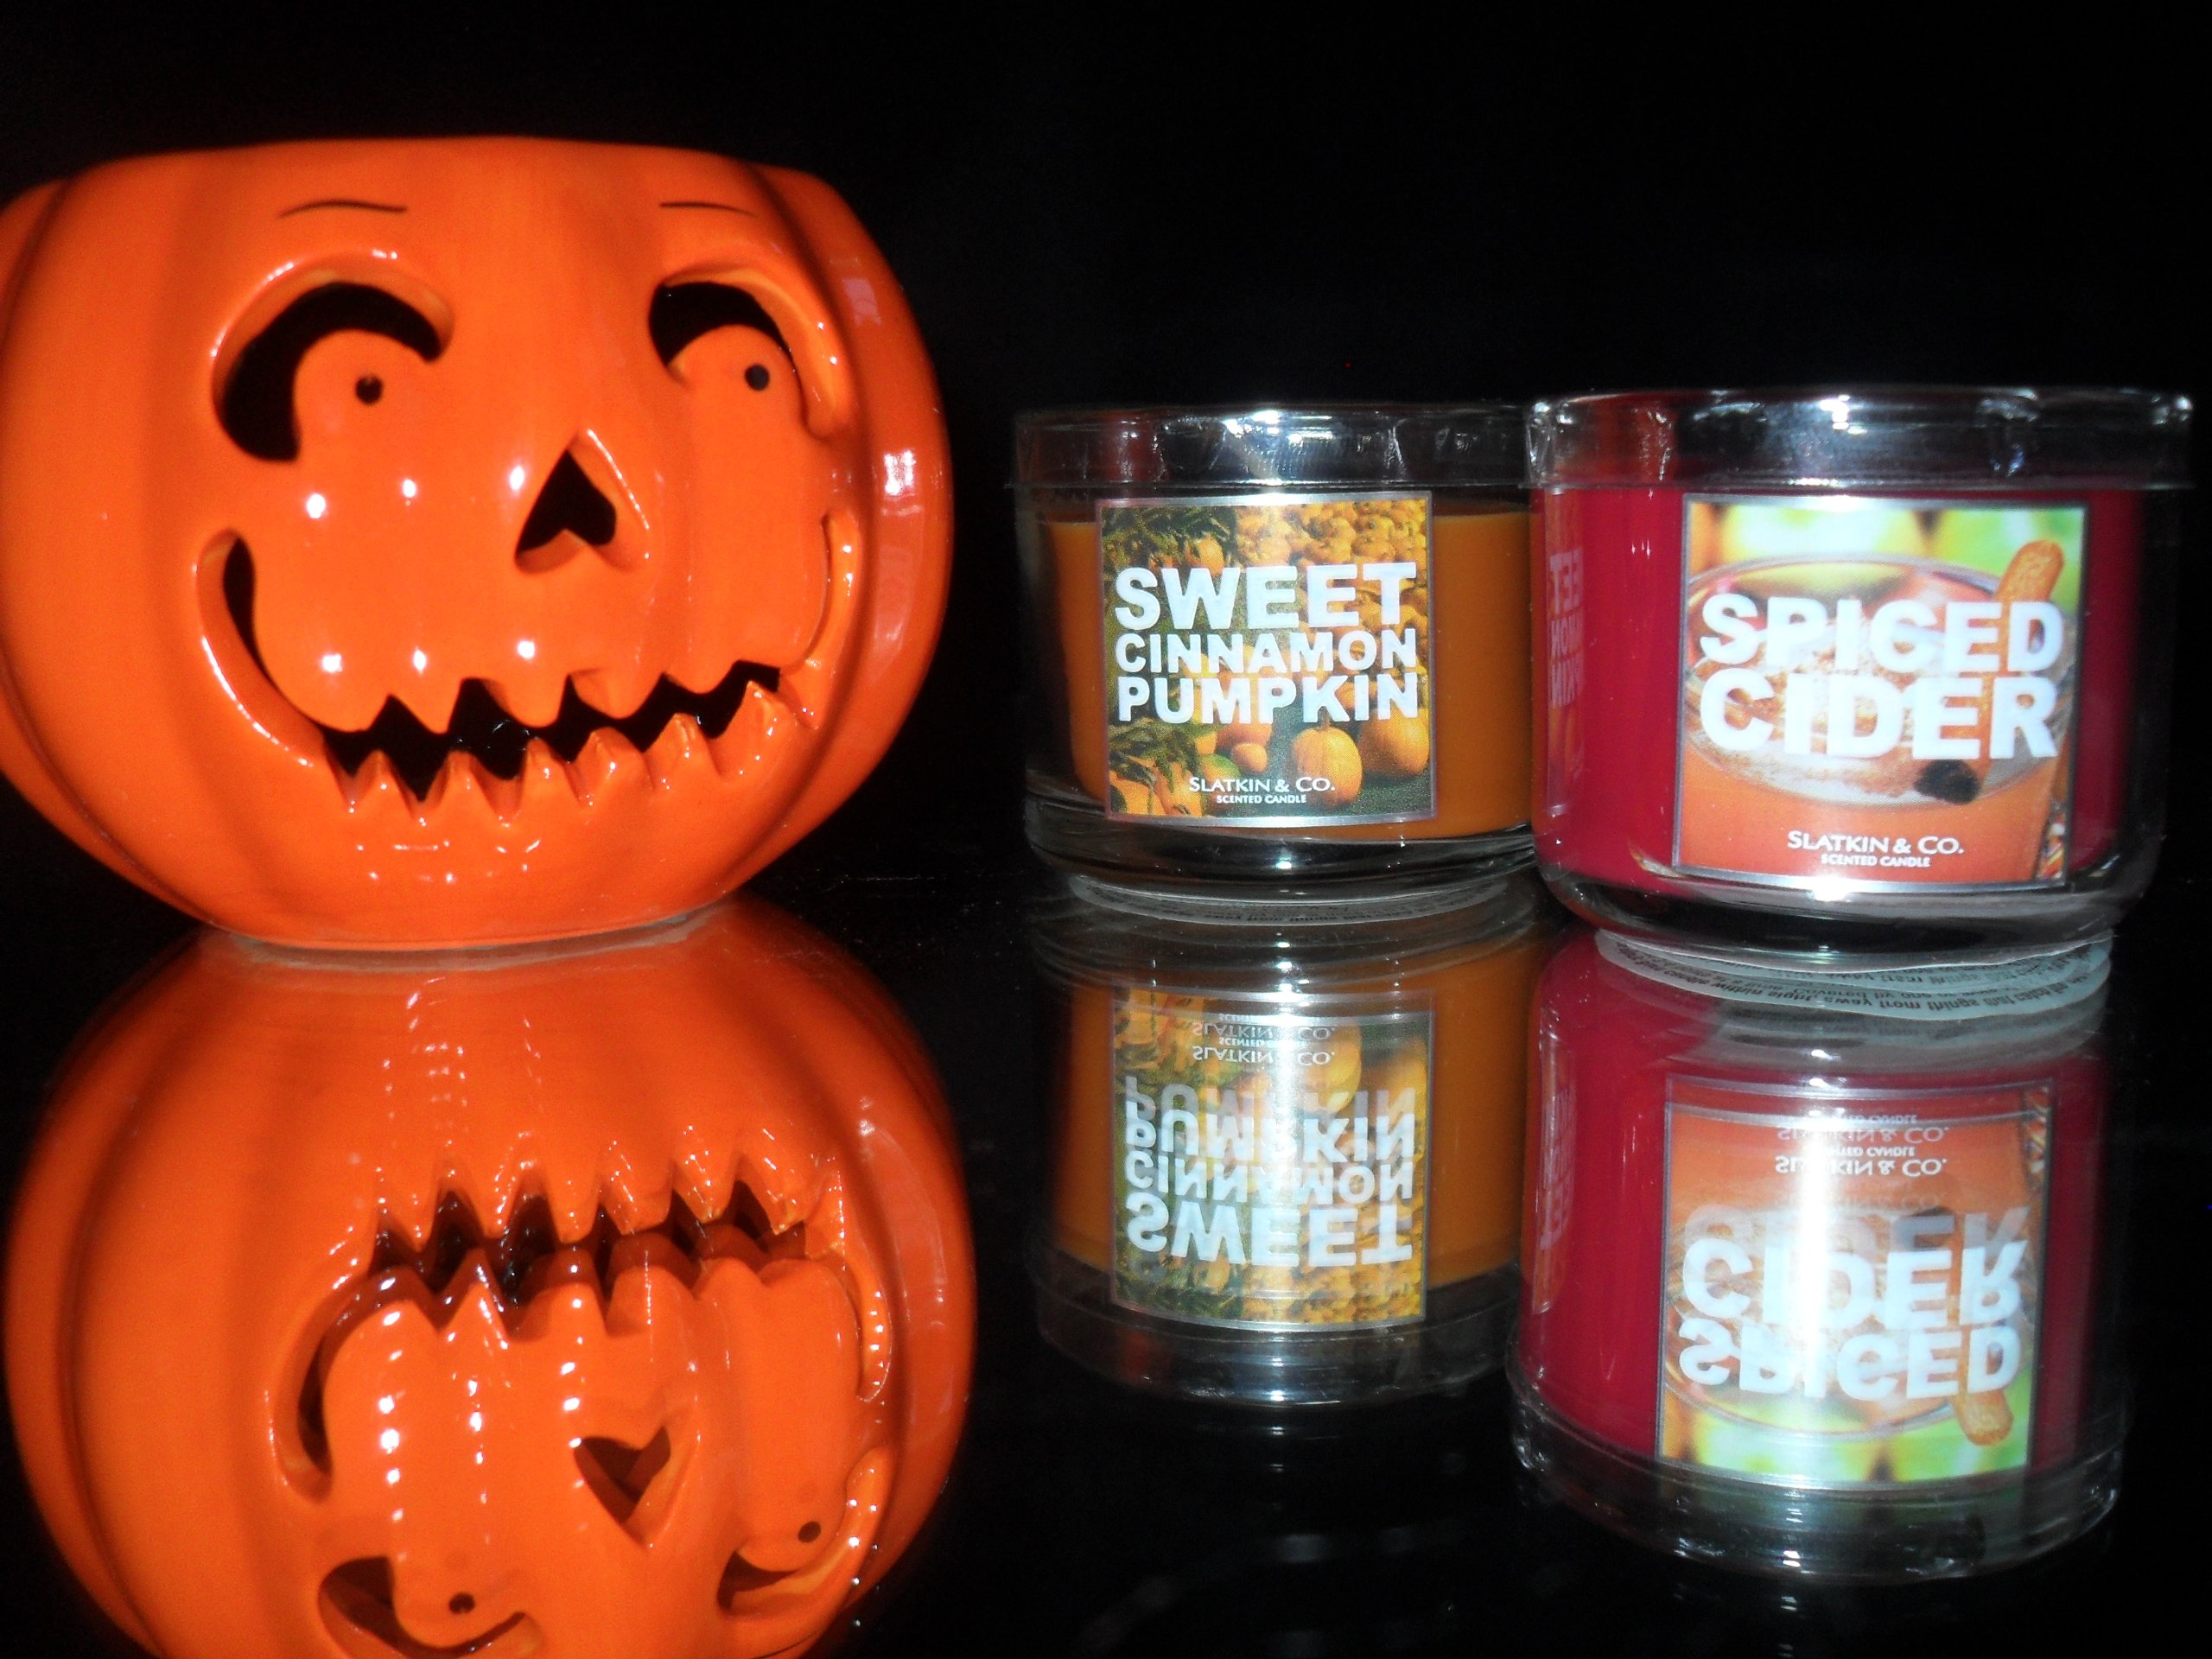 Bath & Bodyworks Ceramic Jack O' Lantern Candleholder & 2 Candles - Spiced Cider & Sweet Cinnamon Pumpkin